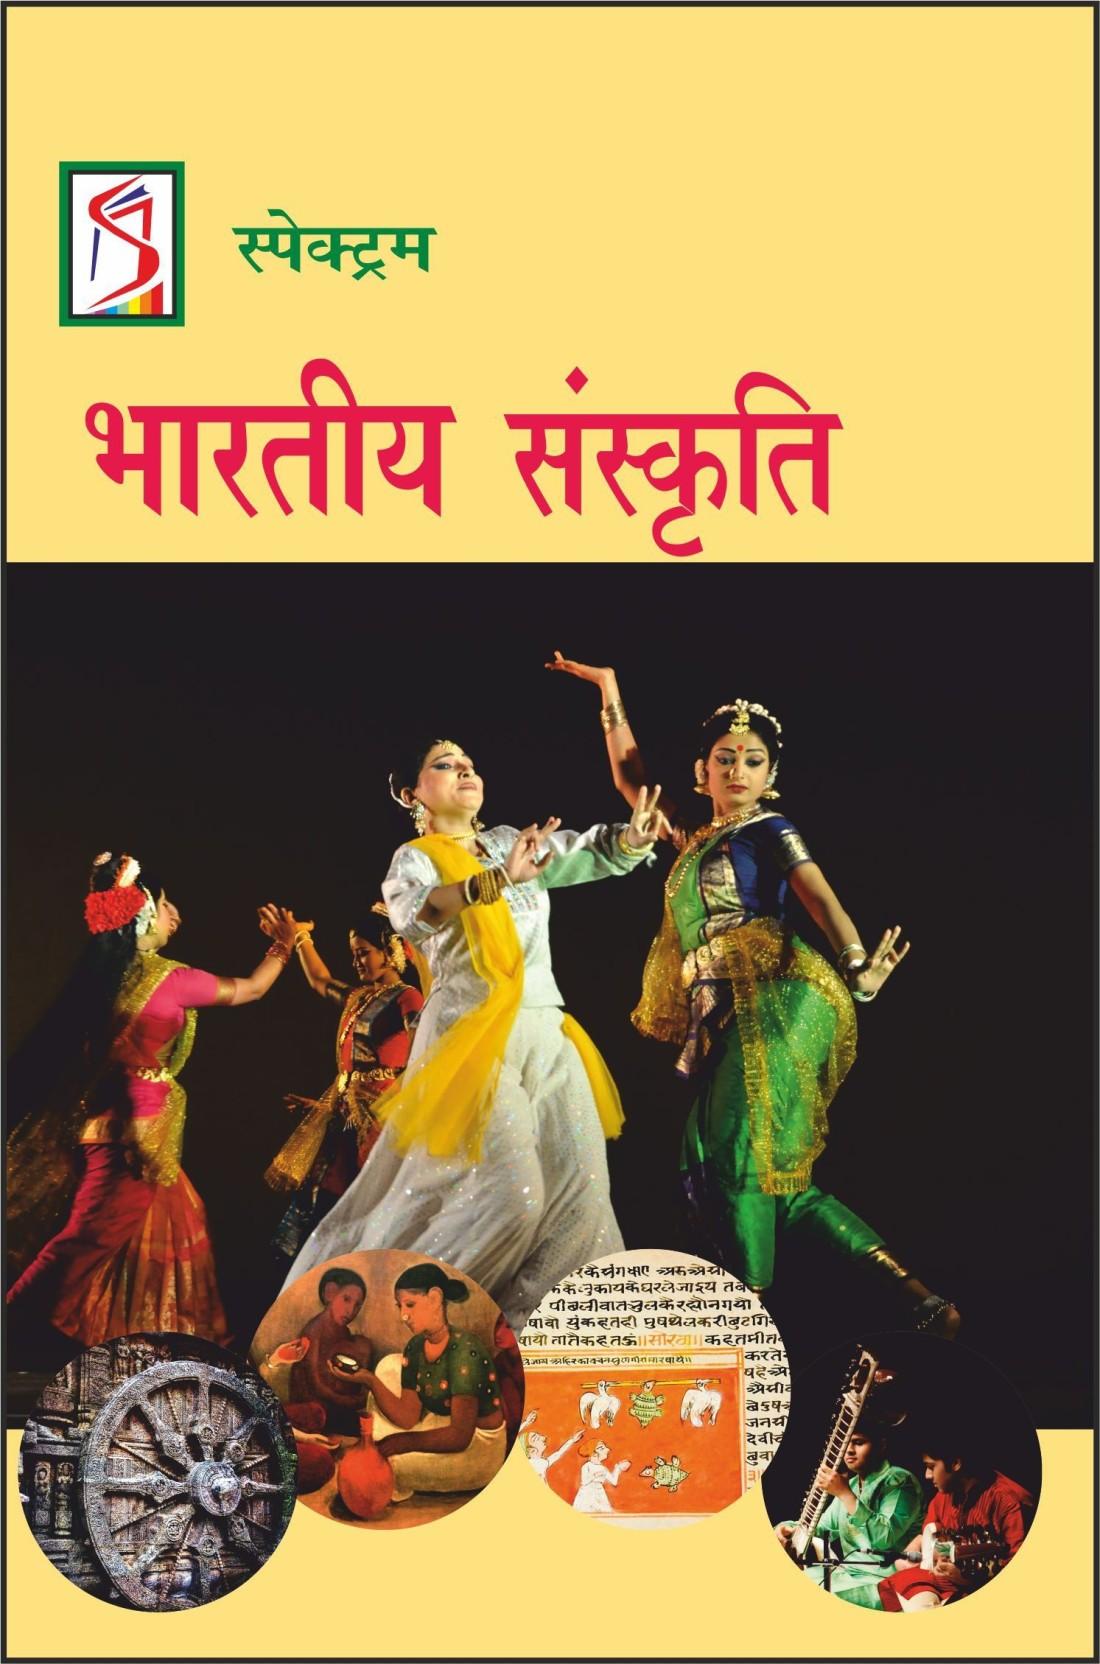 circus advertisement in hindi